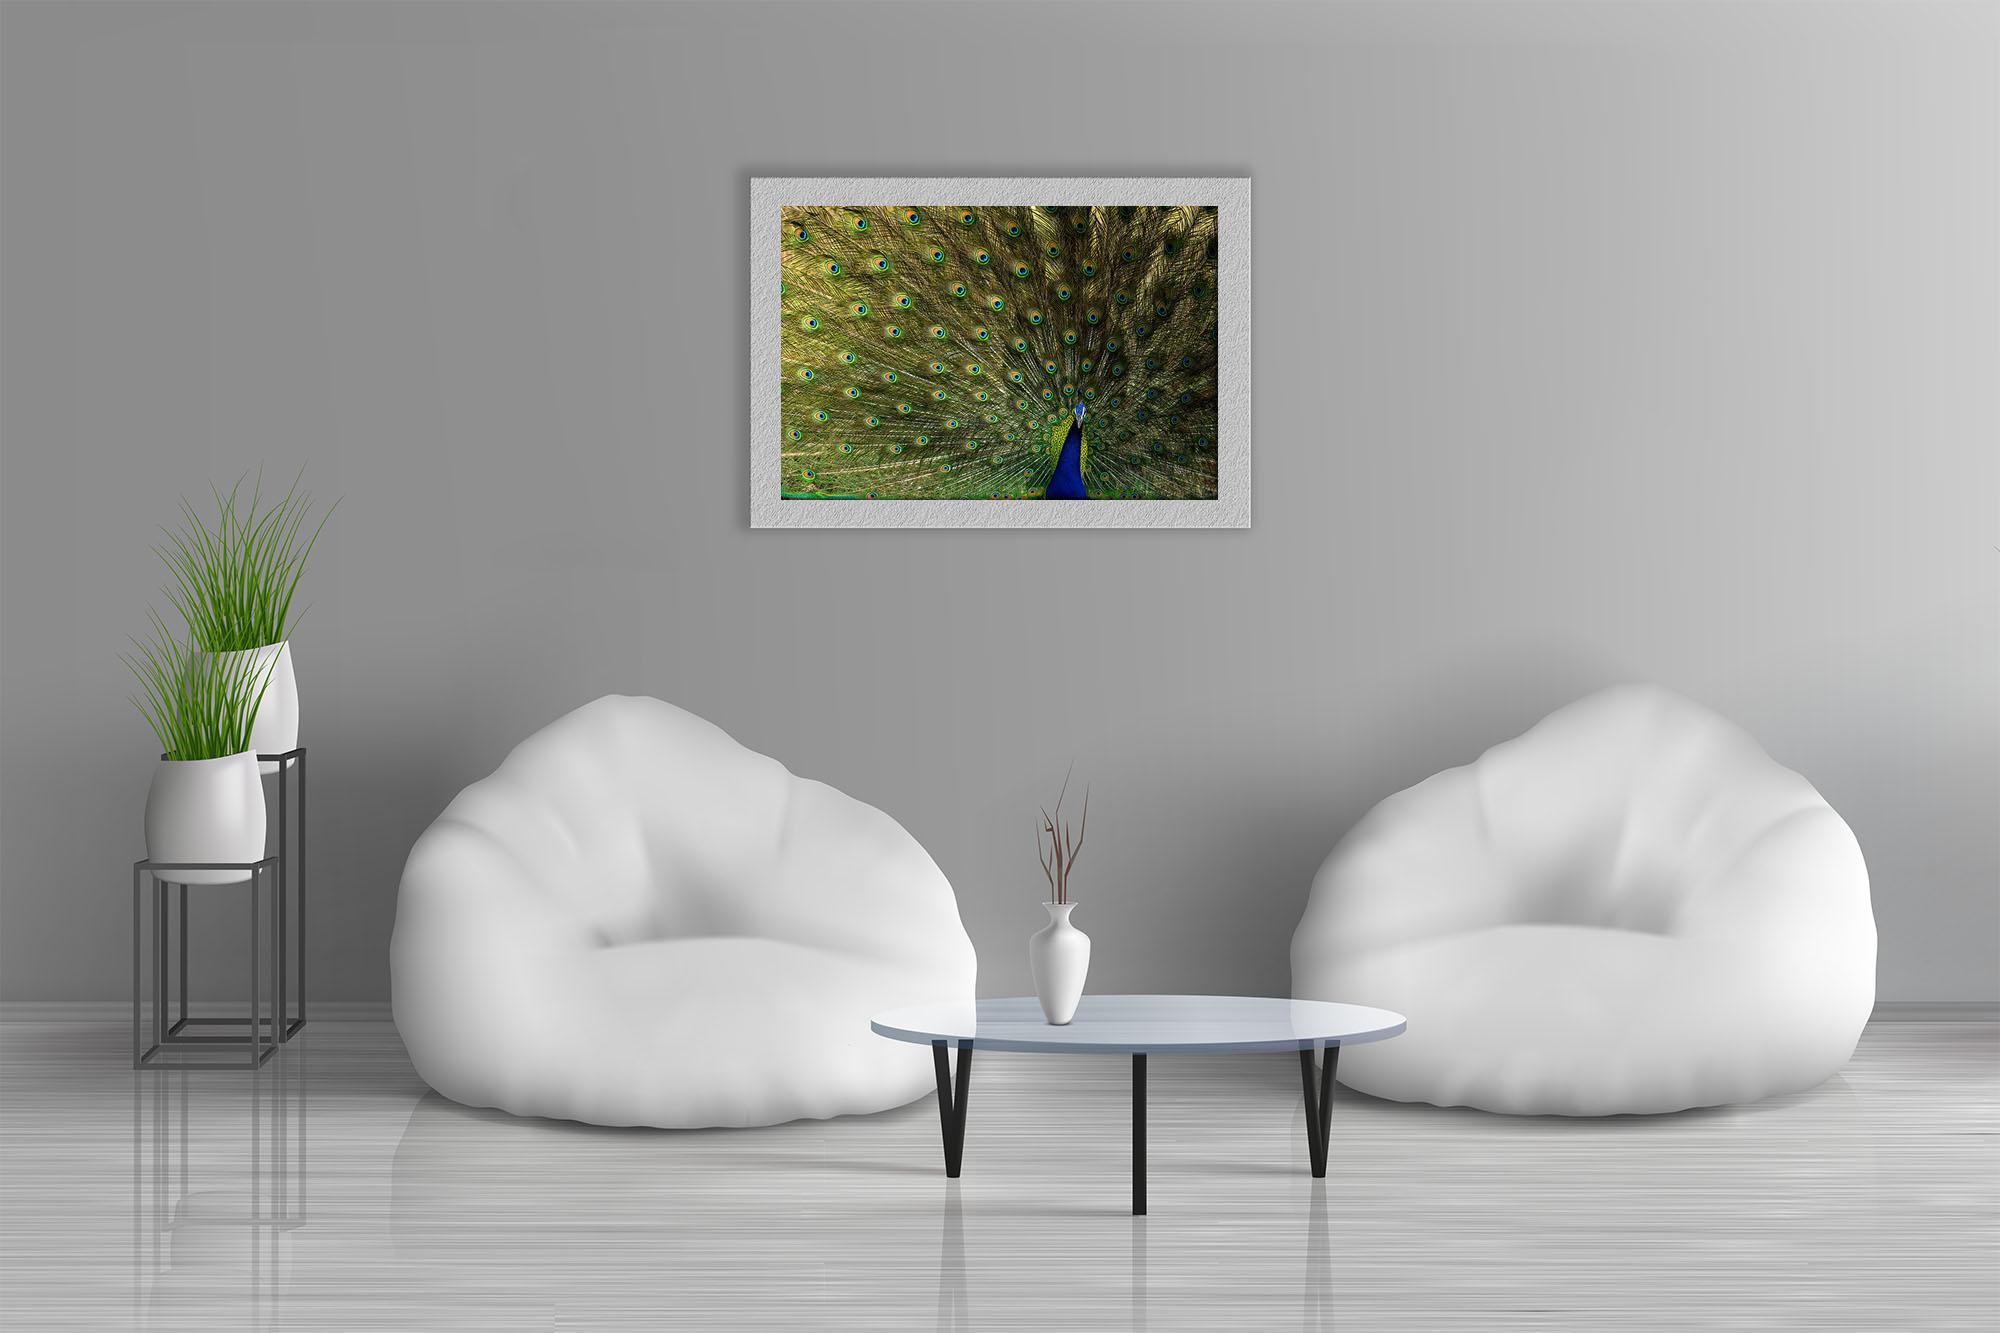 Indian peafowl by Abhilash Kar